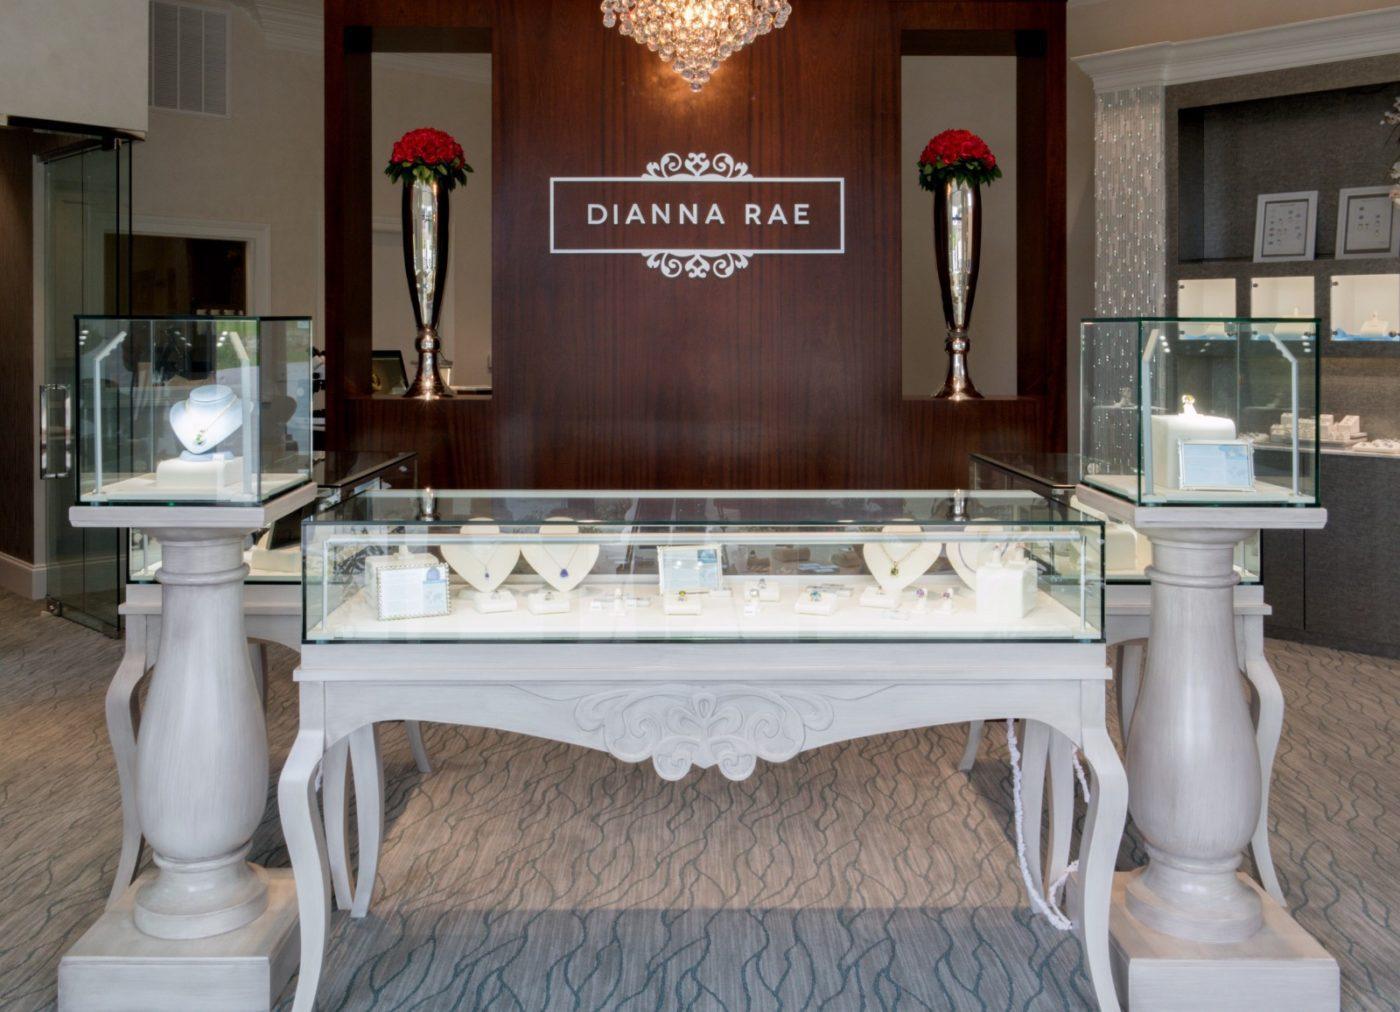 Dianna-Rae-Jewelry-Lafayette-Louisiana-Interior-Entrance ...